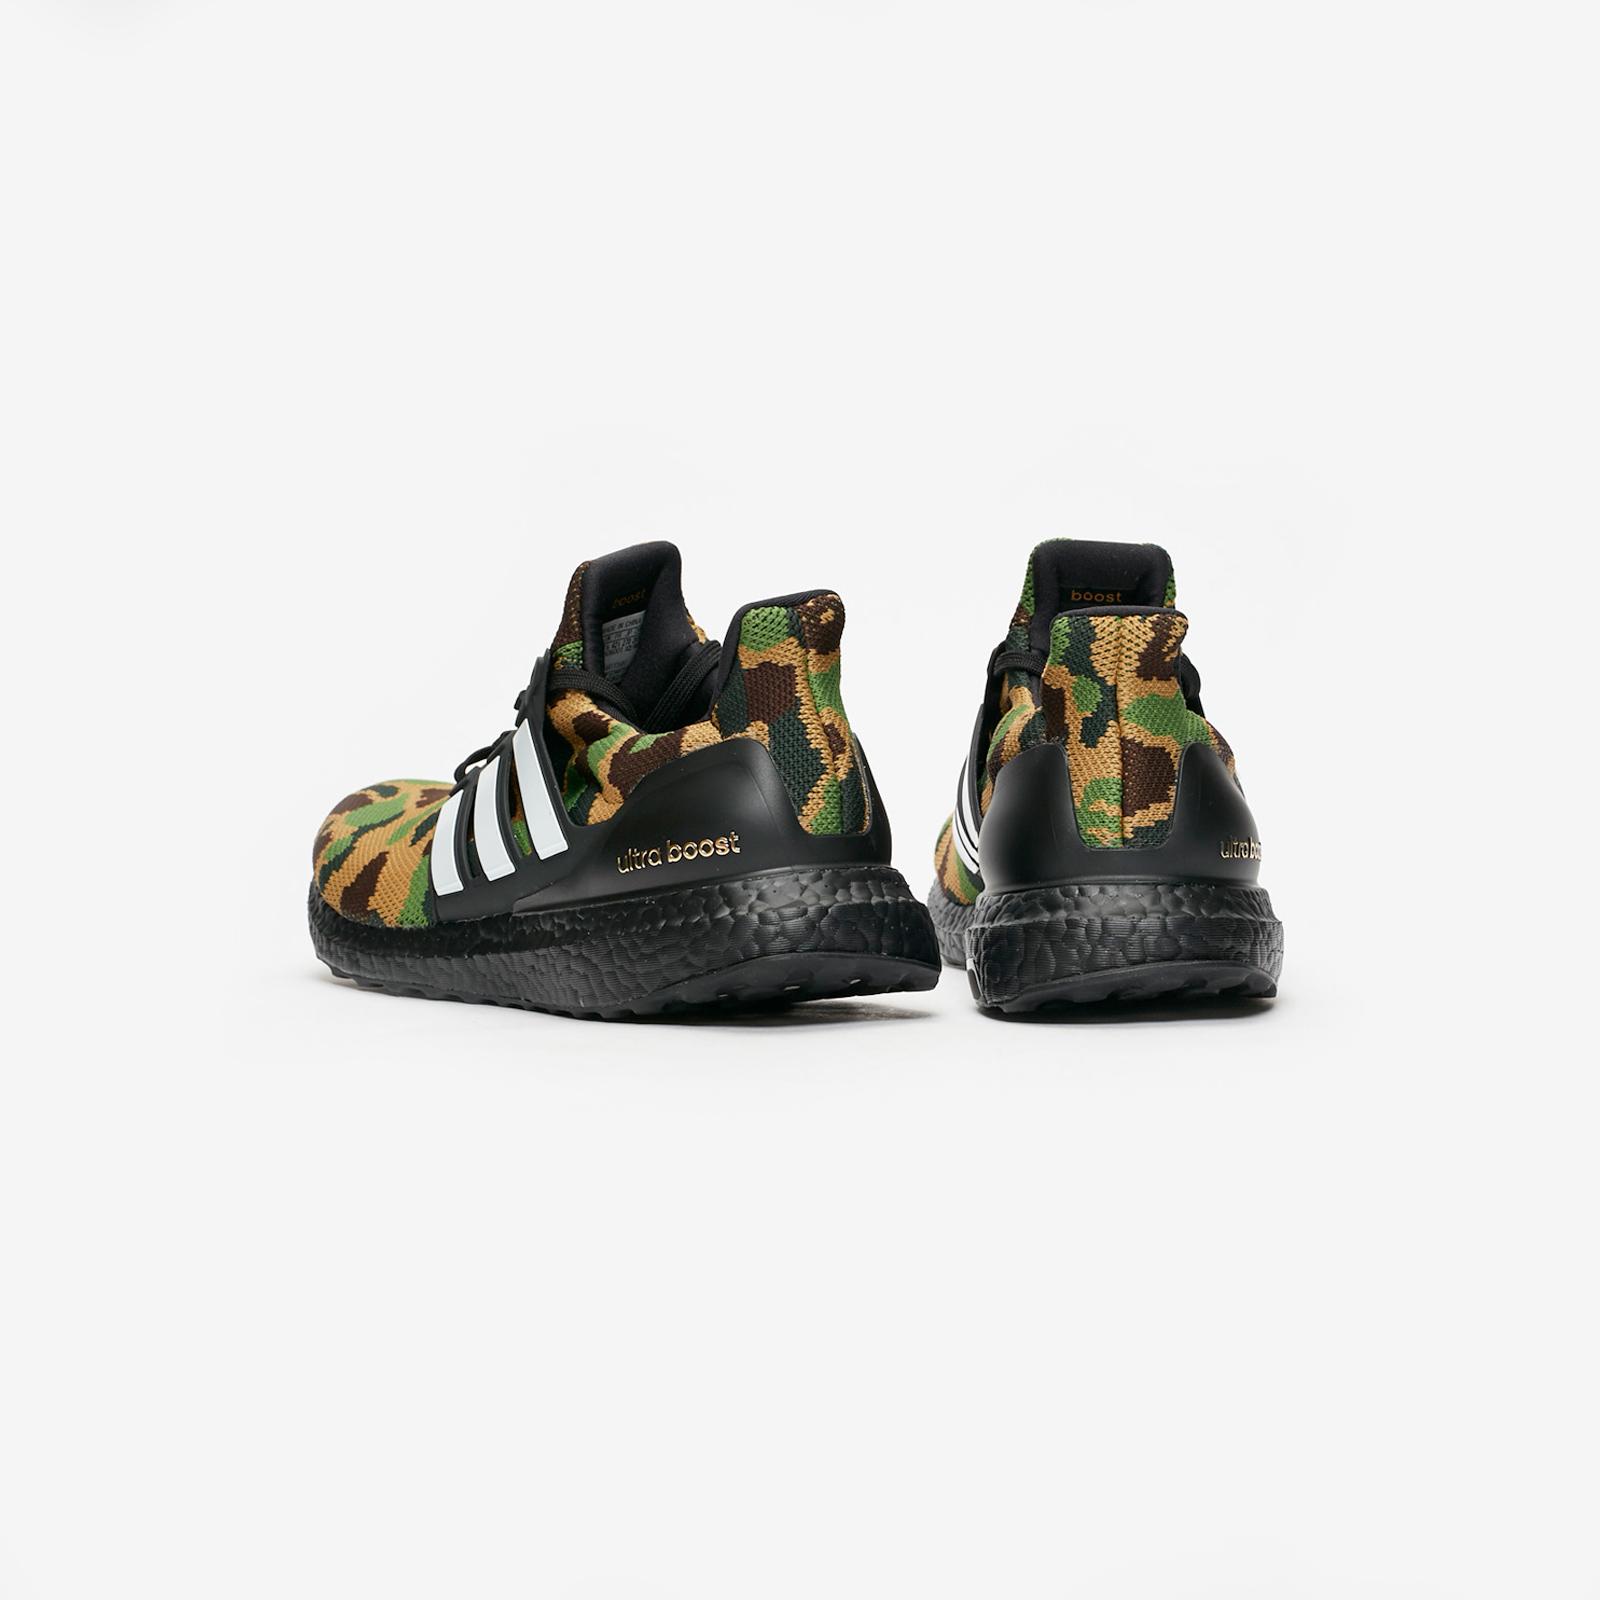 newest 53912 b1e27 adidas UltraBOOST x Bape - F35097 - Sneakersnstuff ...